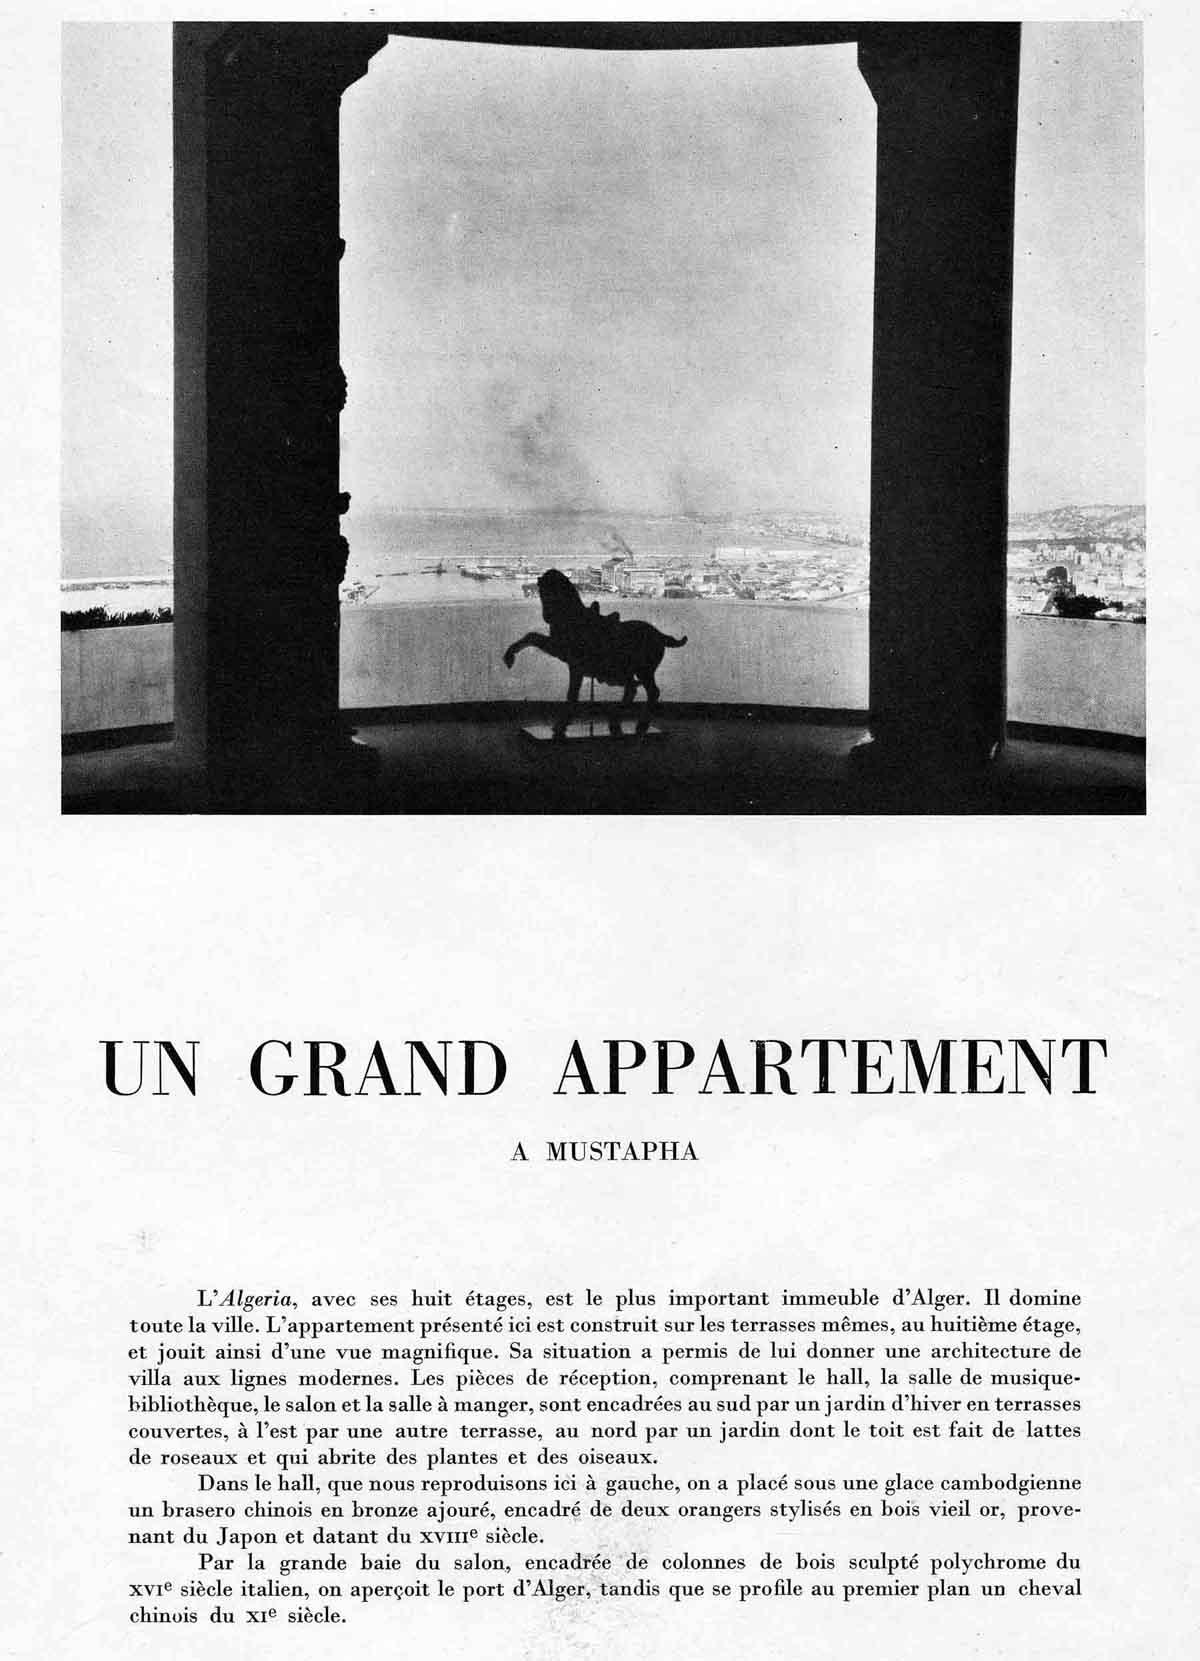 Belles demeures : Un appartement à Mustapha